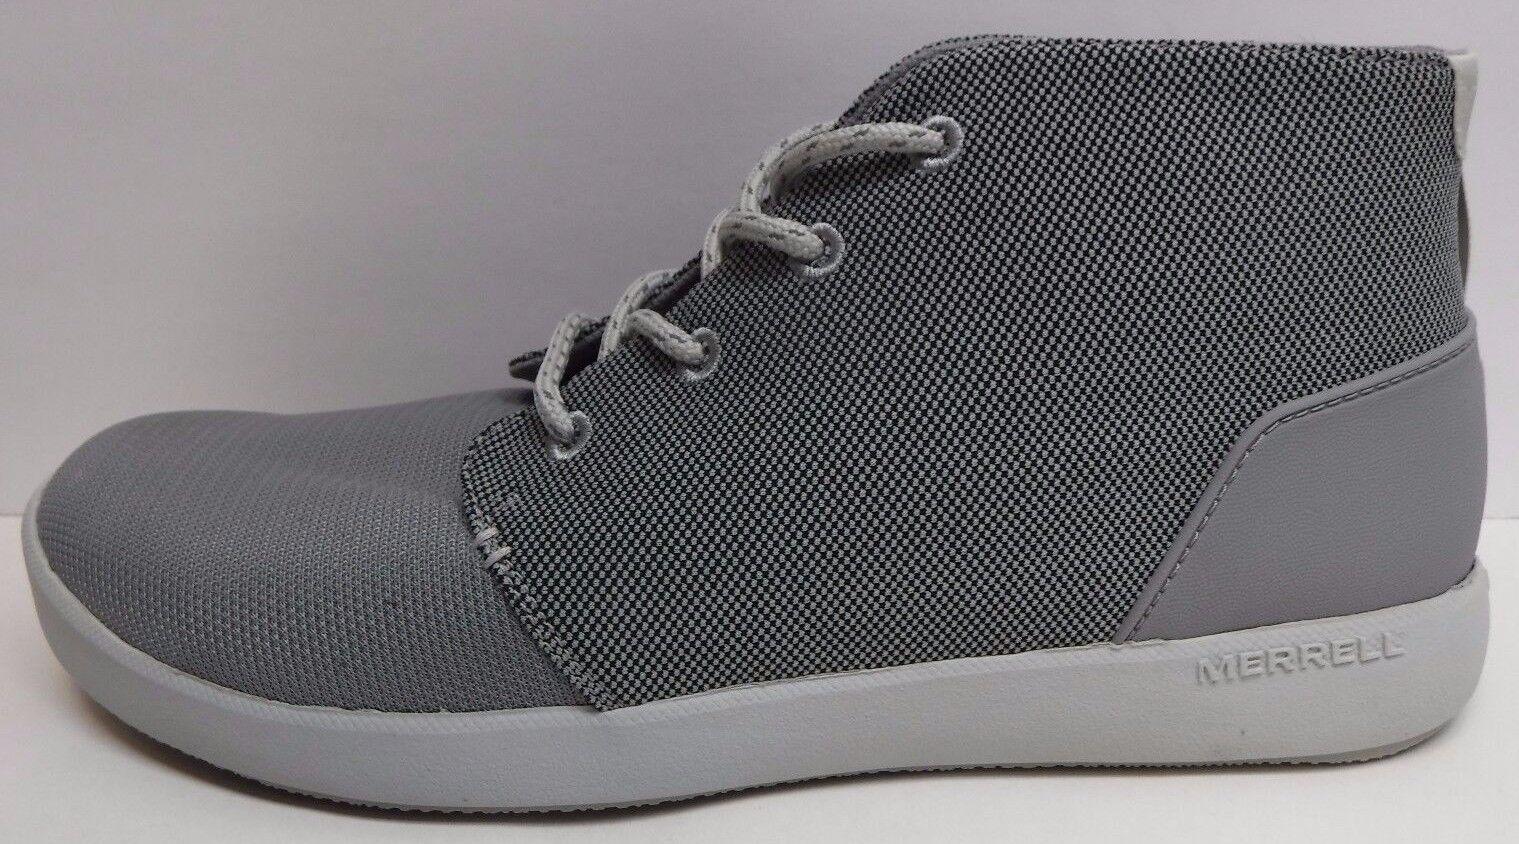 Merrell Size 9.5 Grigio Chukka Boots Scarpe da Ginnastica New Uomo Shoes